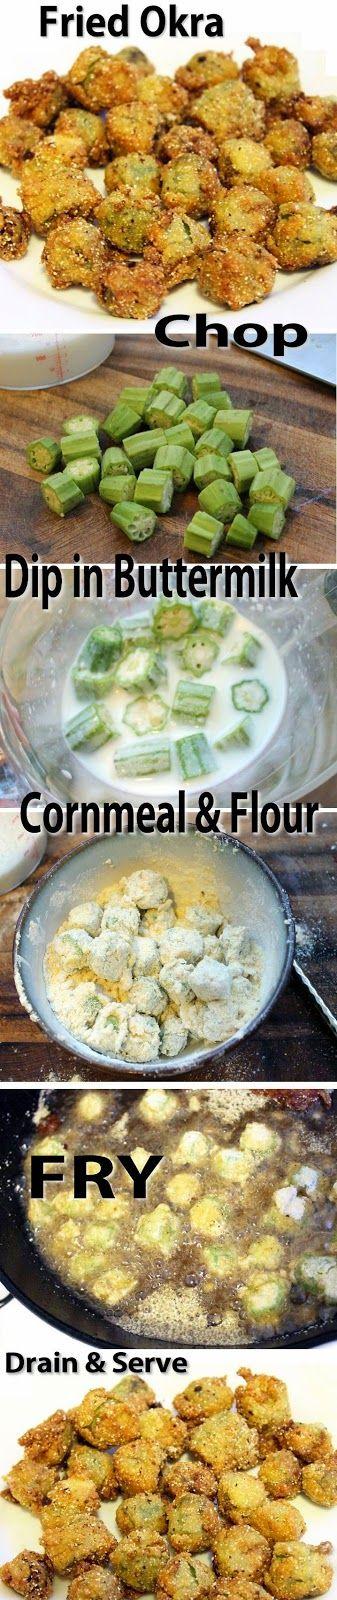 Fried Okra- More seasoning- Good                                                                                                                                                      More